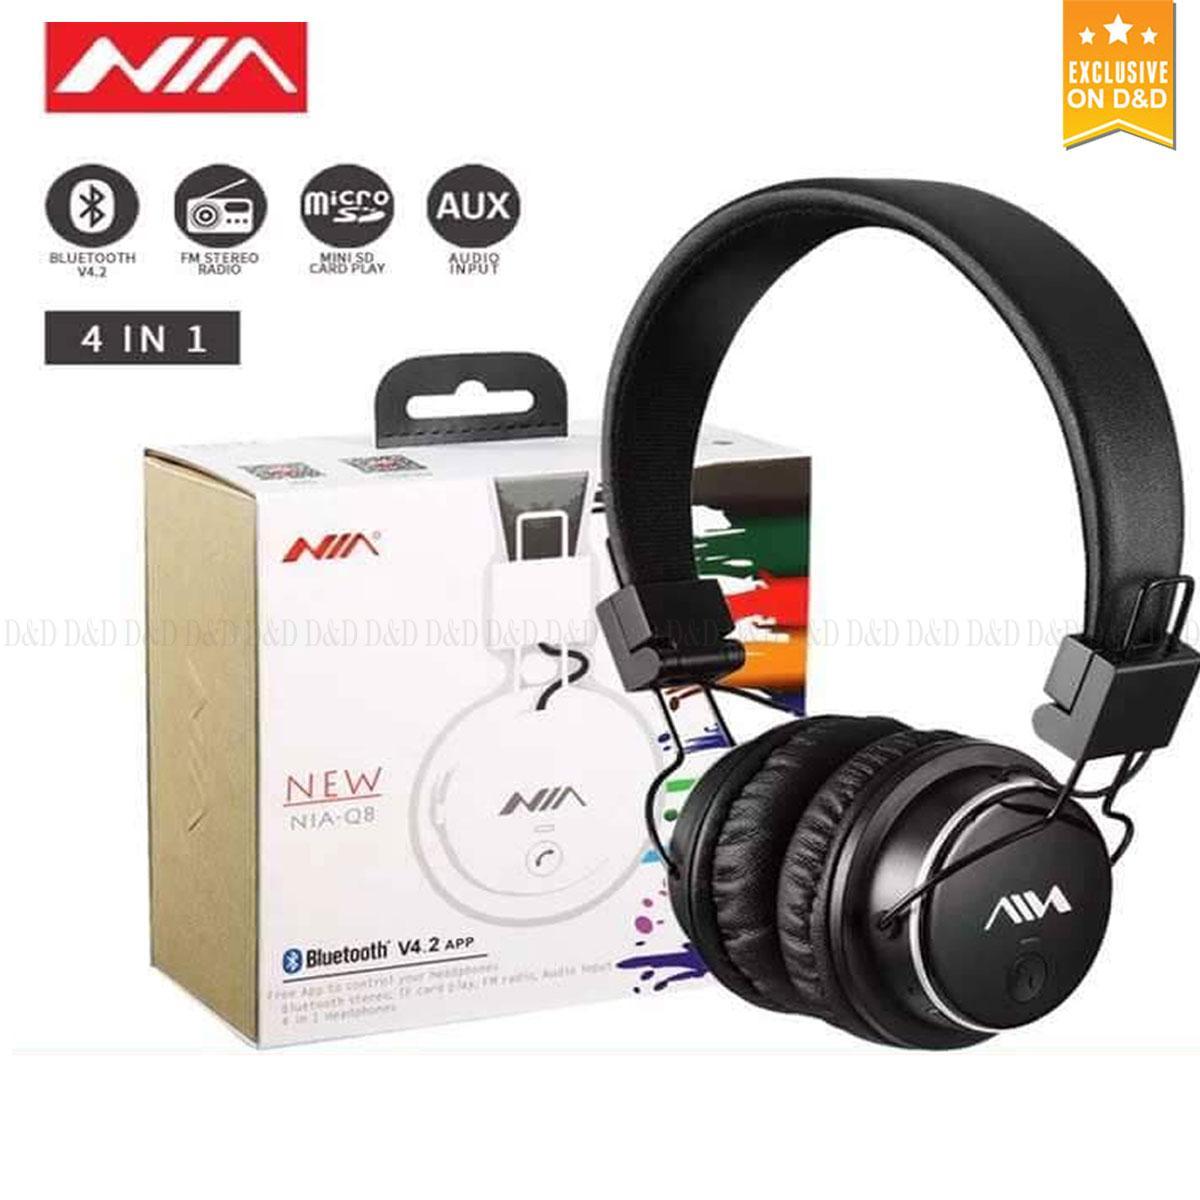 d2e4ff6a16e NIA Original Q8 Bluetooth Stereo Wireless Headphones Foldable Earphones  with Microphone Support TF Card FM Radio